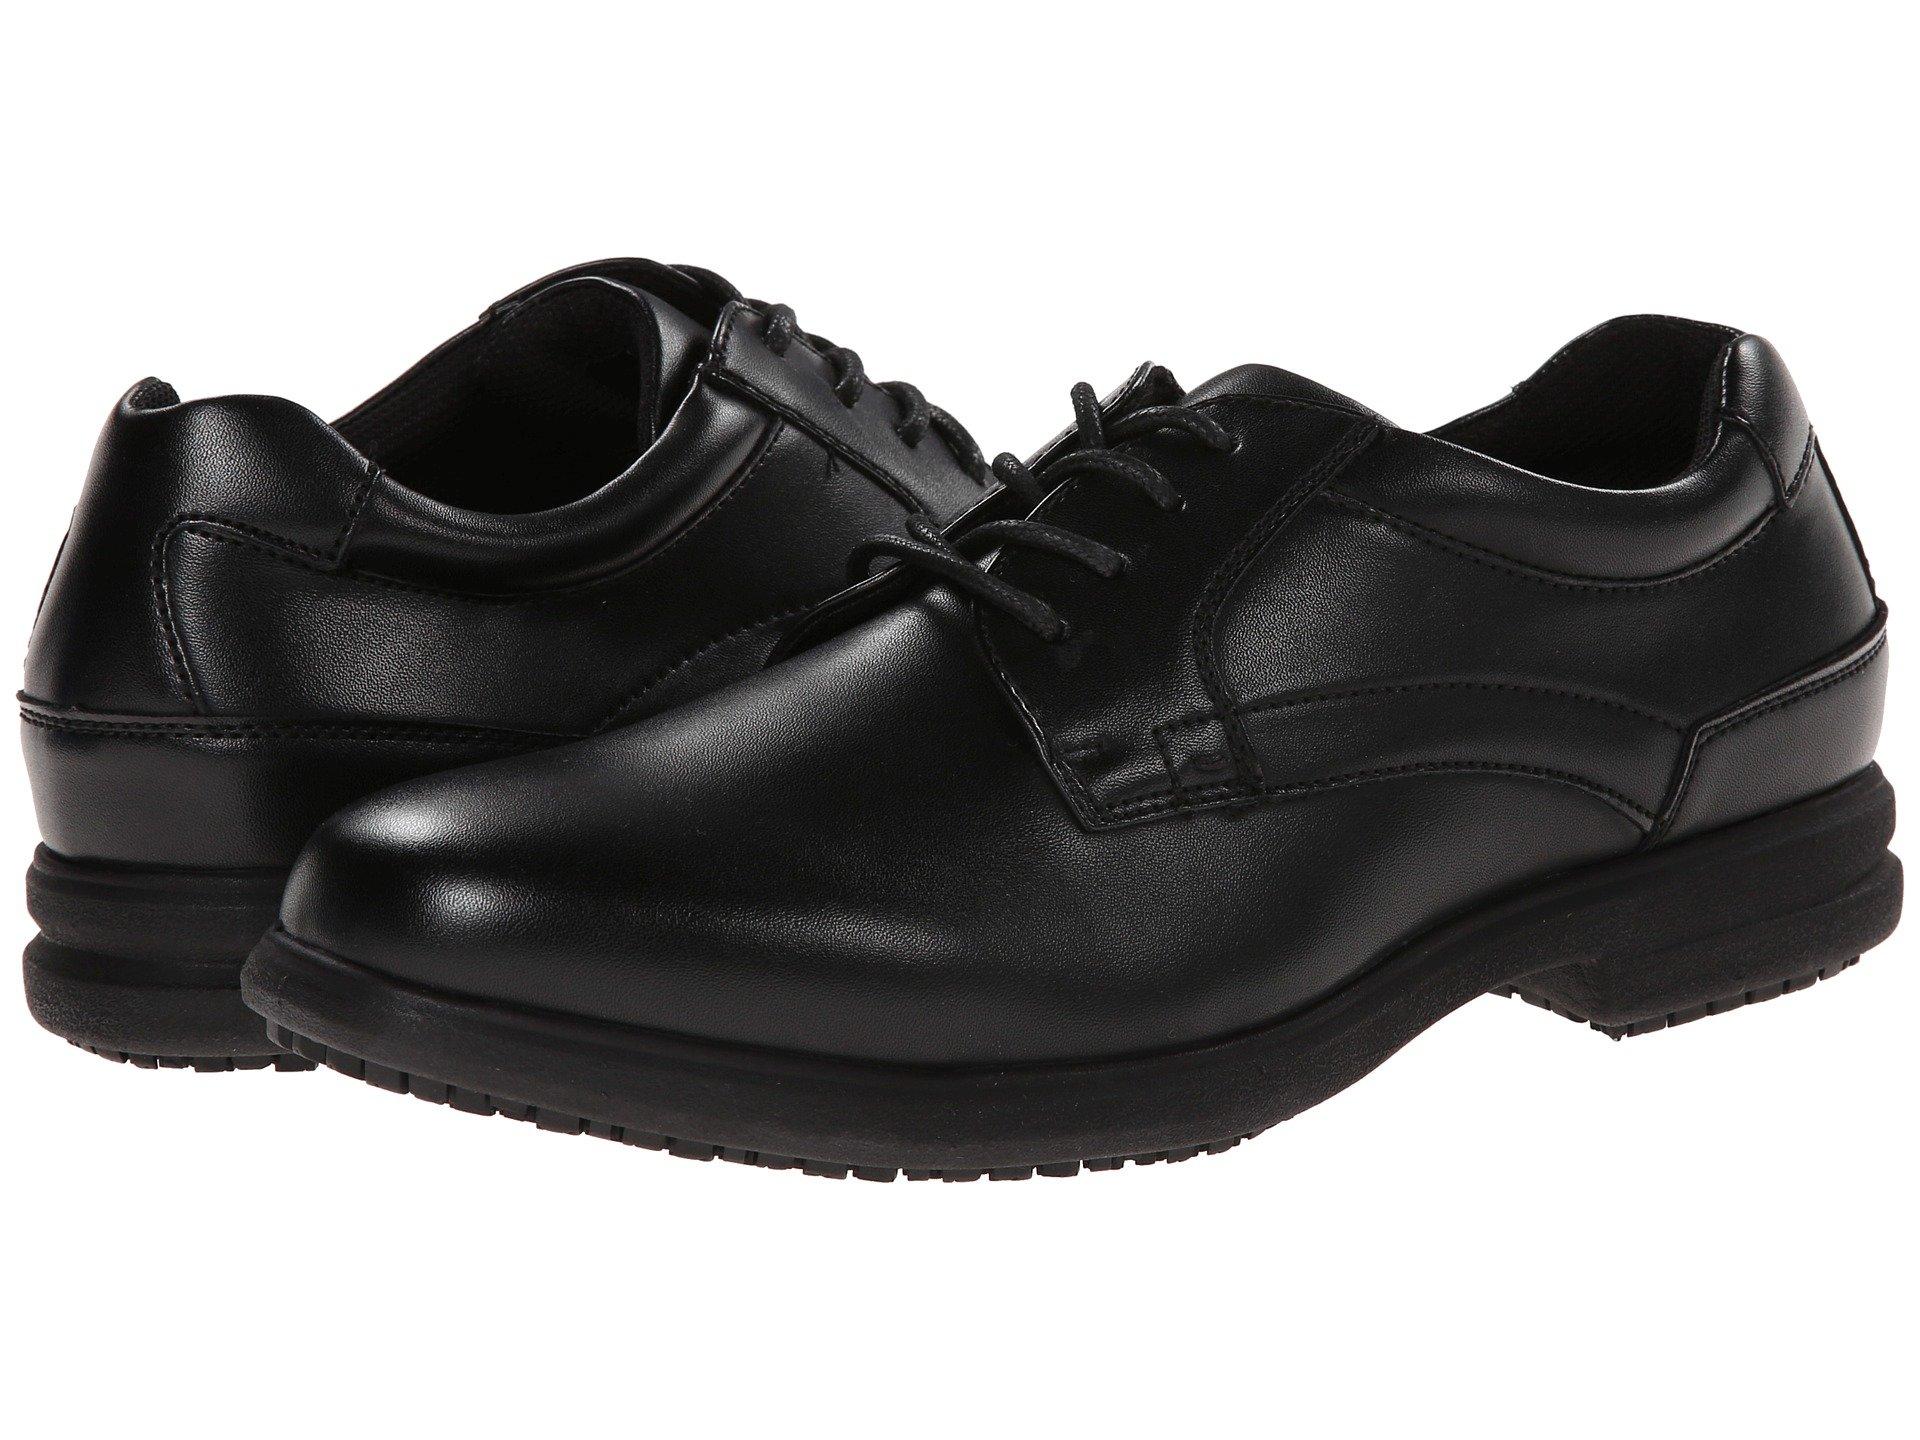 51fd8664a888 Men s Nunn Bush Shoes + FREE SHIPPING